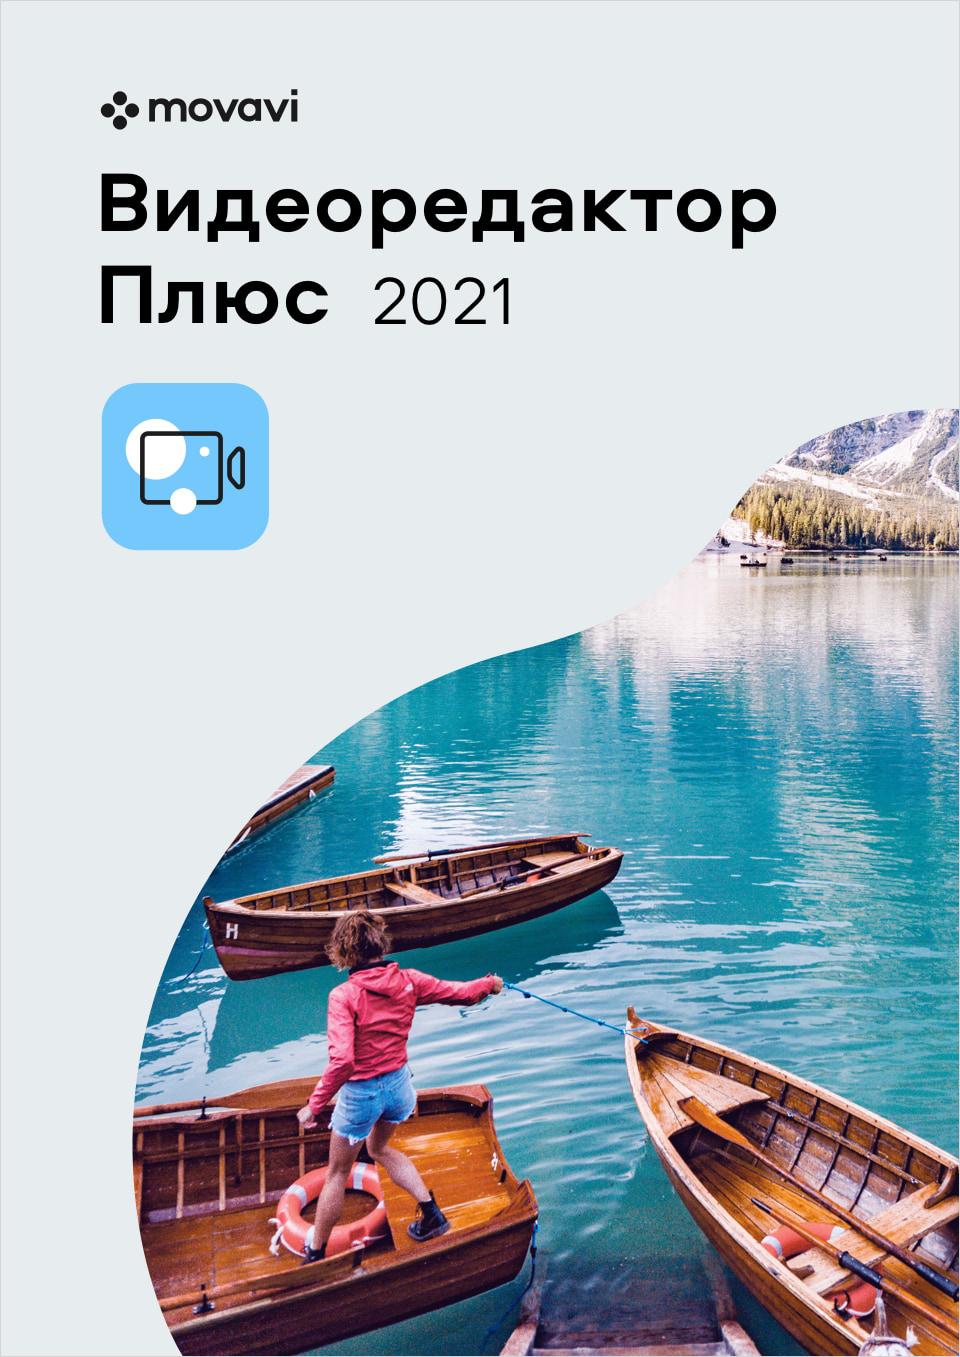 Movavi Видеоредактор Плюс 2021. Бизнес-лицензия [PC, Цифровая версия] (Цифровая версия)